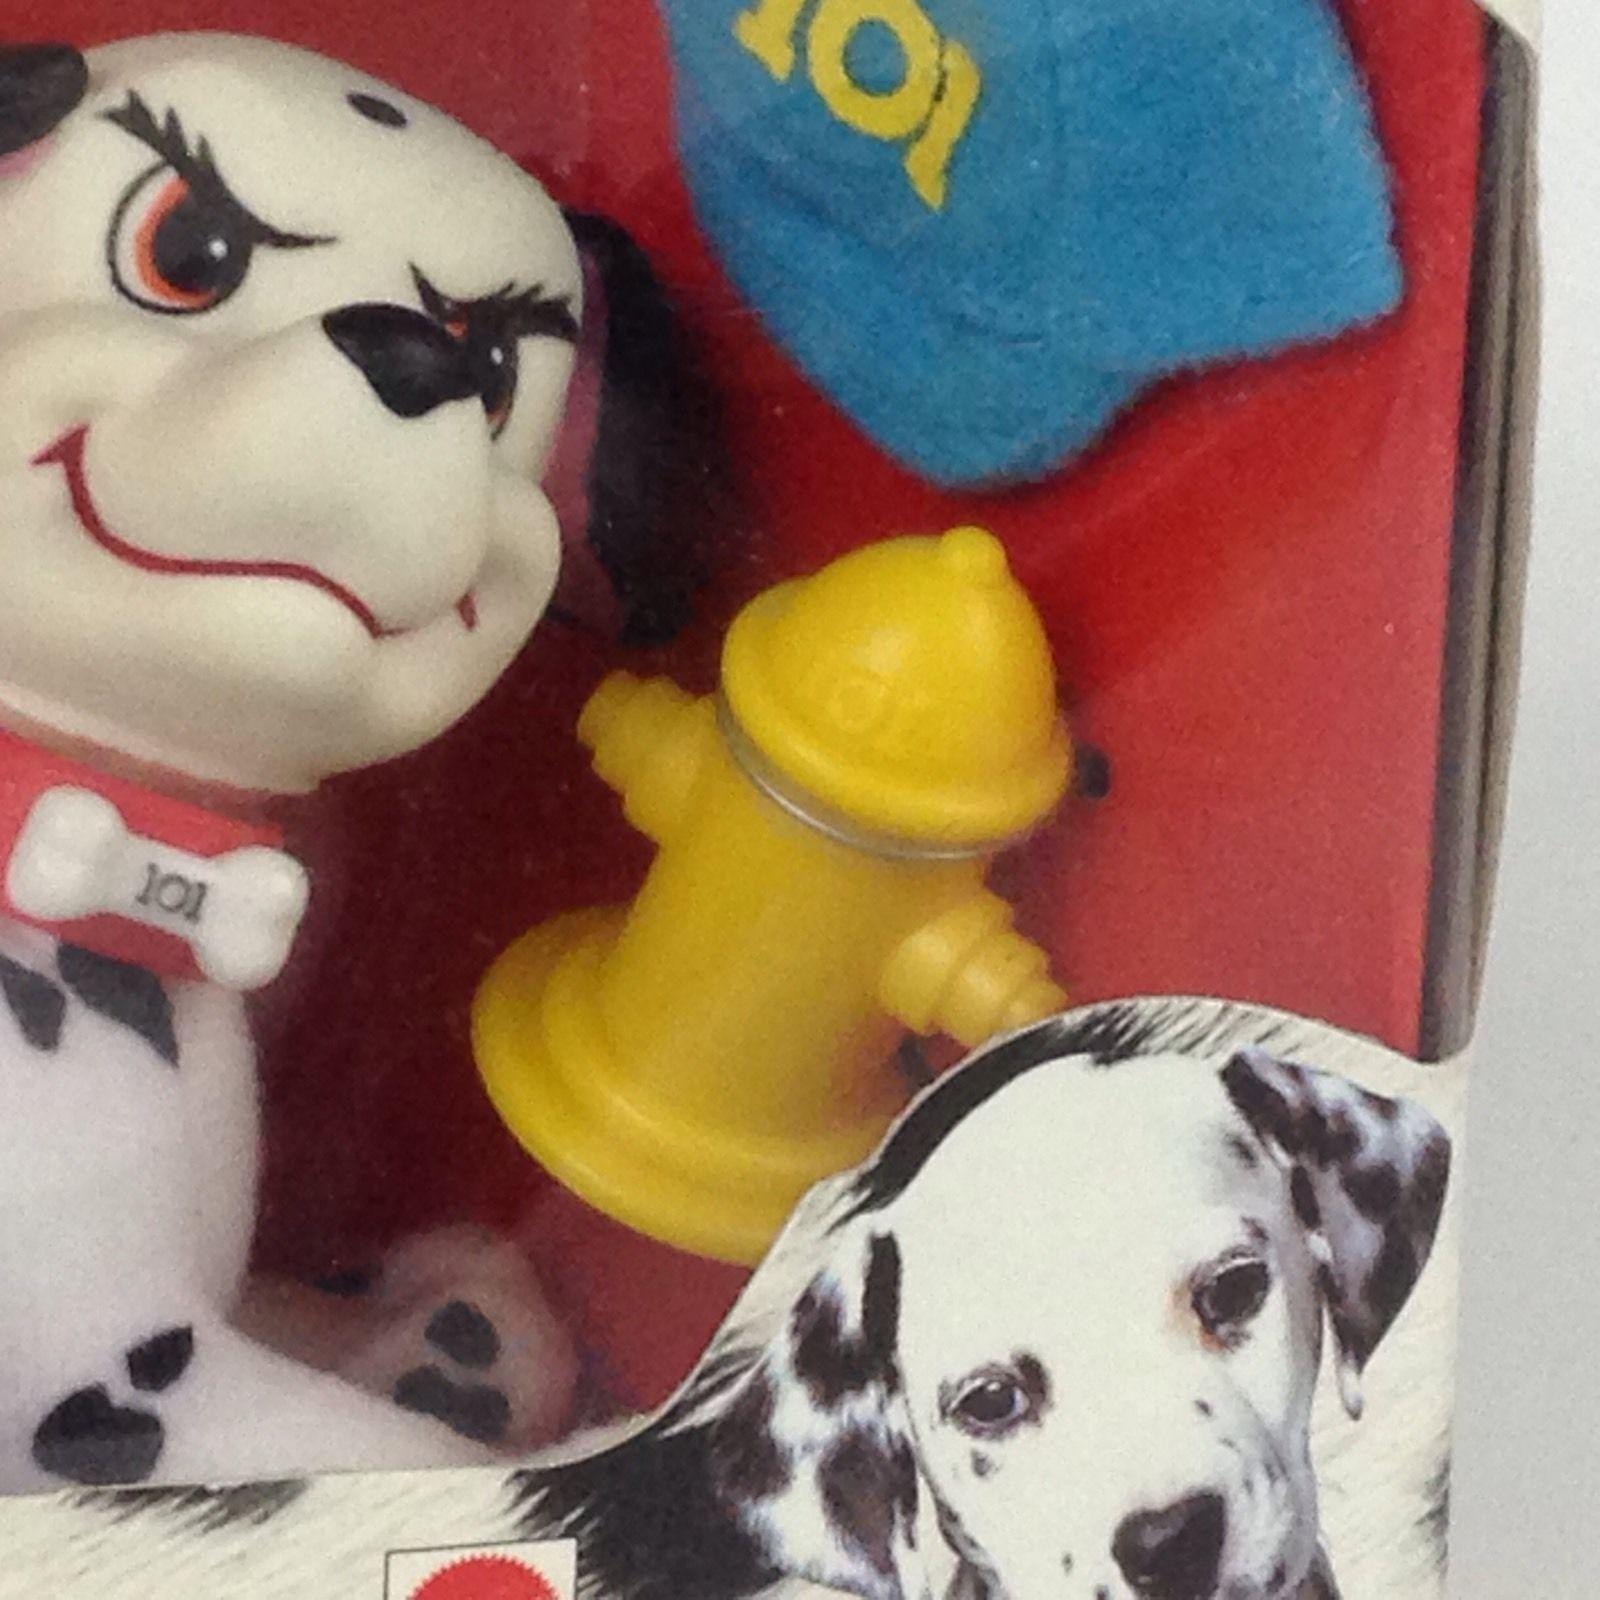 Disney 101 Dalmatians Wizzer Small Plush Puppy to Love New